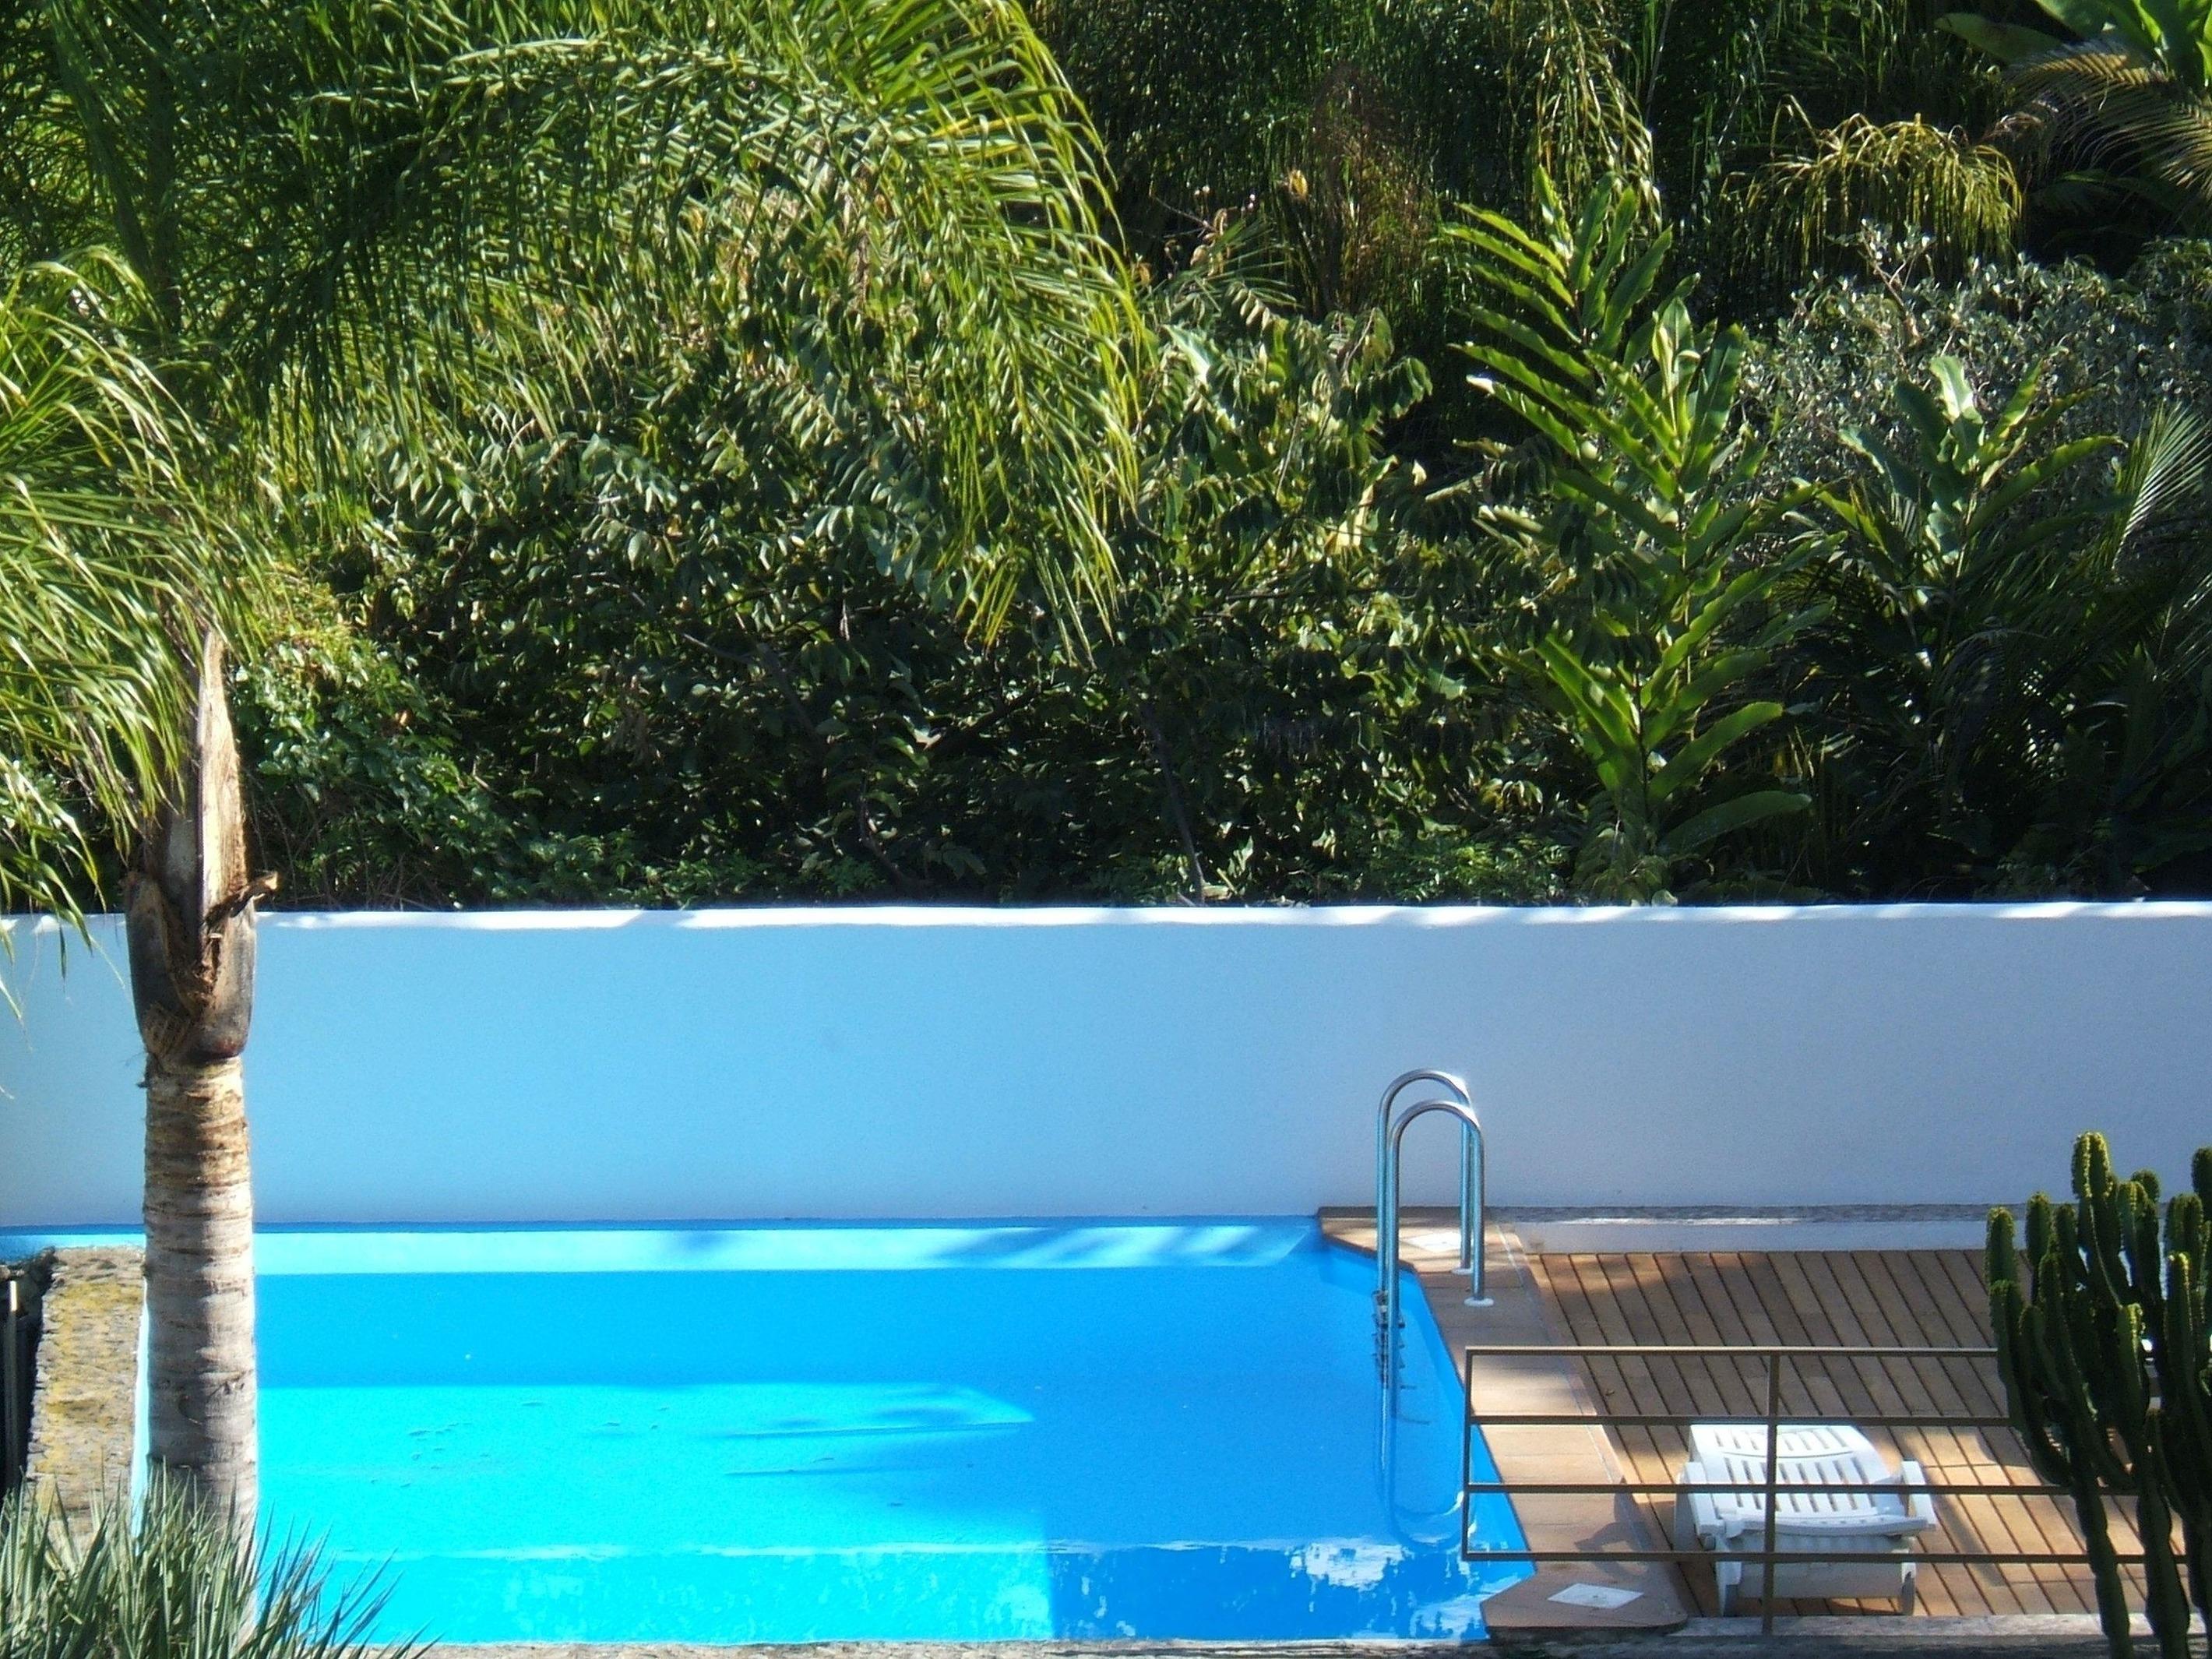 Appartement de vacances Fewo Strelitzia, im Grünen, am kleinen See, direkt am Strelitziengarten, mit Pool, Grill,  (2492987), Santa Ursula, Ténérife, Iles Canaries, Espagne, image 22